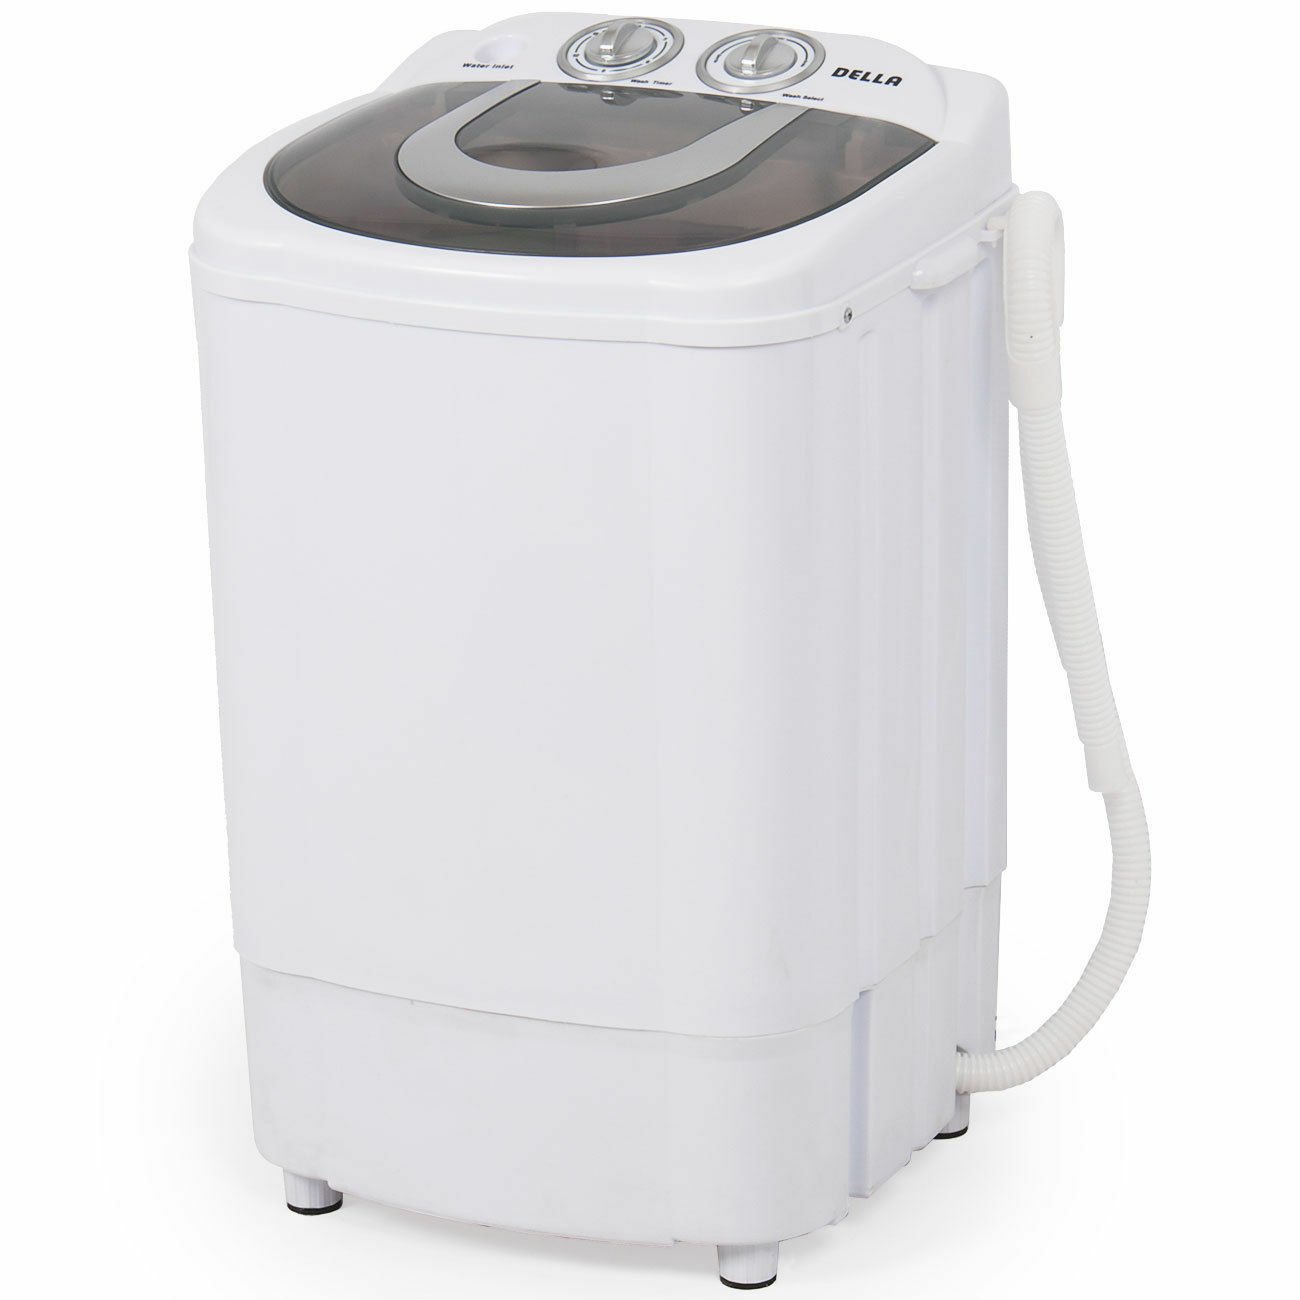 Mini Portable Washing Machine Spin Wash 8.8Lbs Capacity Compact Laundry  Washer